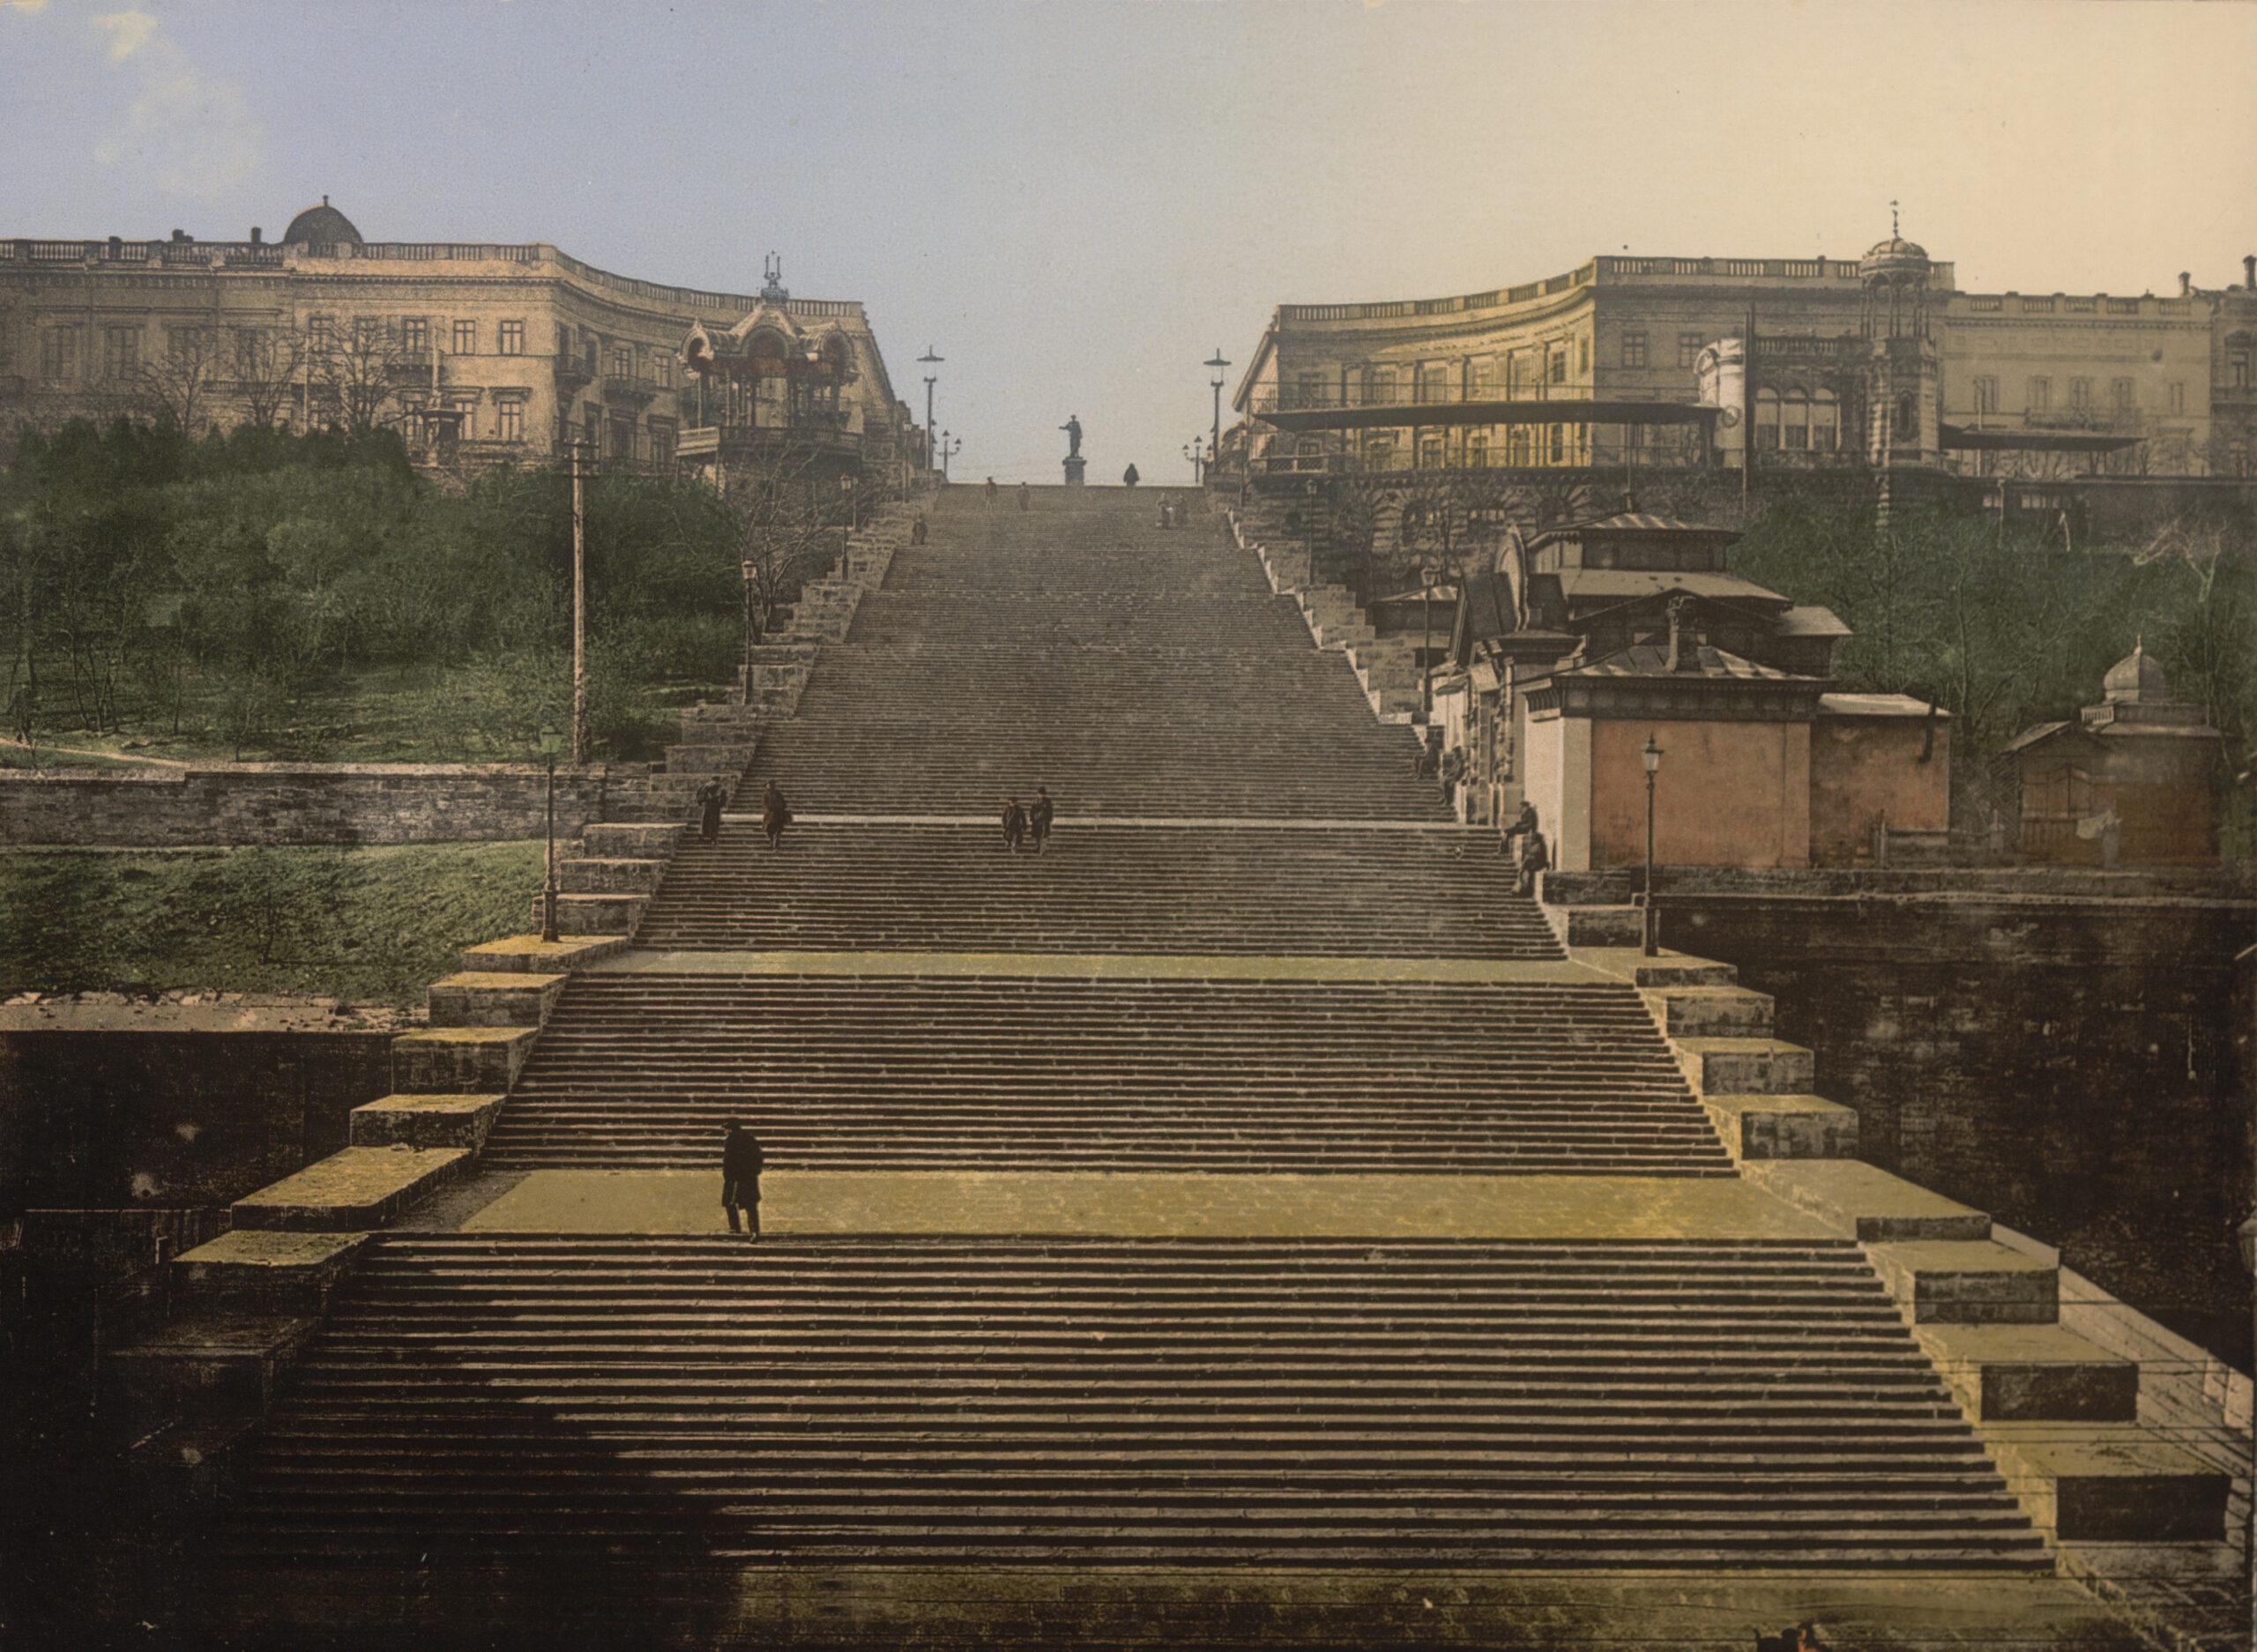 Odessa Treptele Potemkinjpg